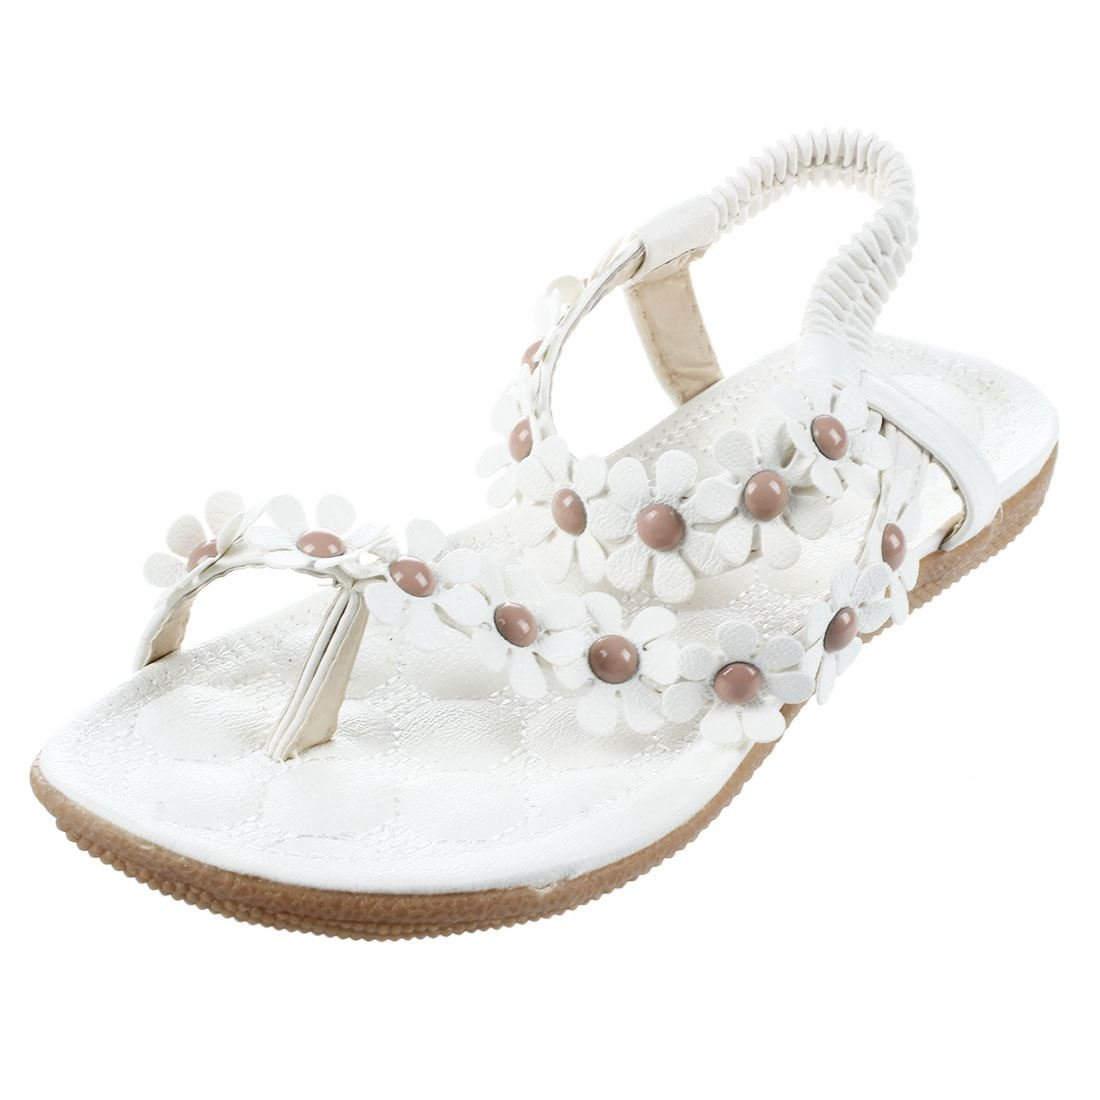 SODIAL(R) New Flip-flop sandals open toe flip women's shoes flat flats bohemia flower beaded soft outsole sweet for women 669 white US8.5=EUR39=feet length 24.5CM